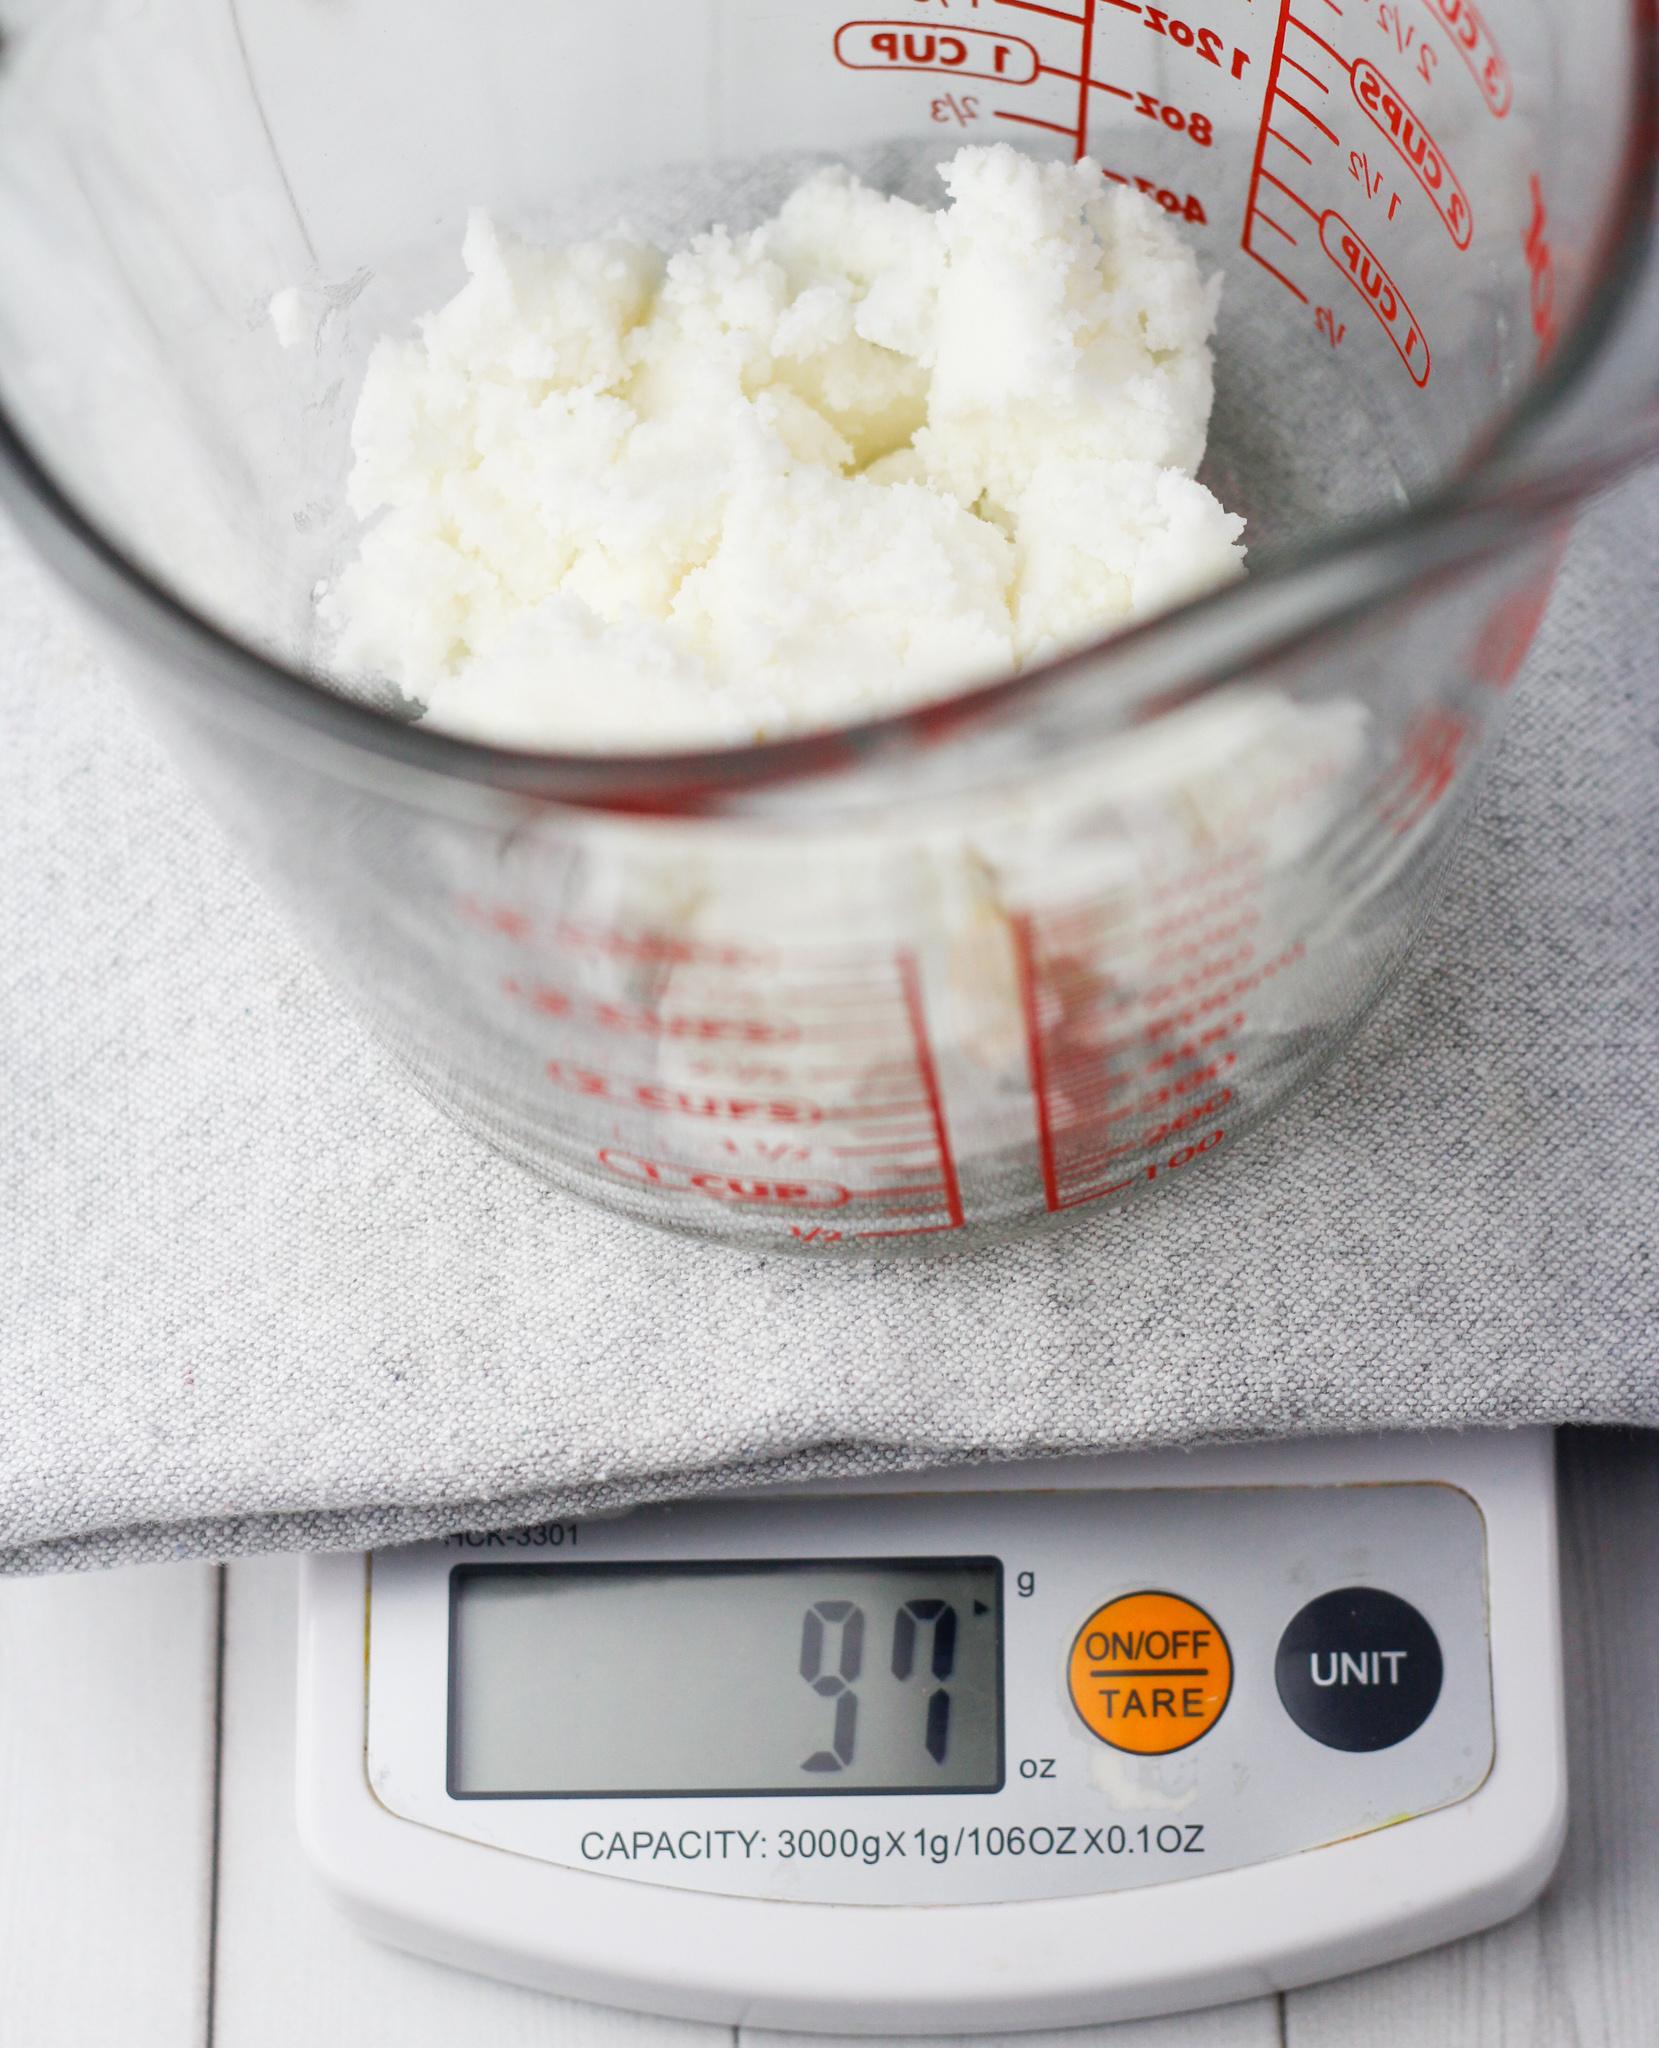 shea butter in measuring bowl